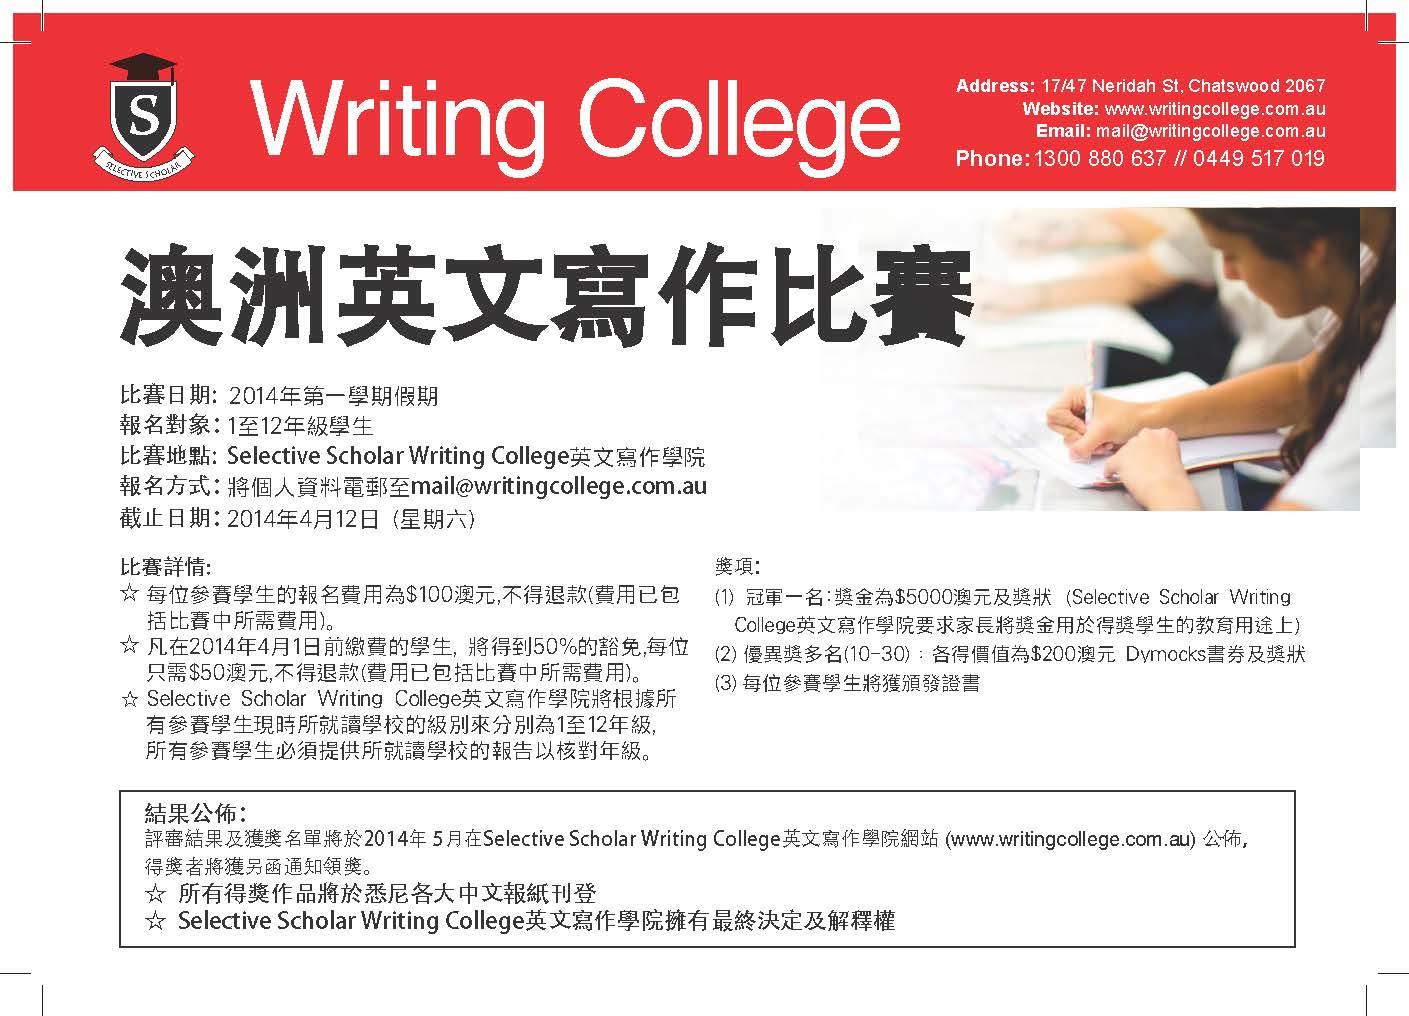 Chinese Sydney Weekly 1.jpg